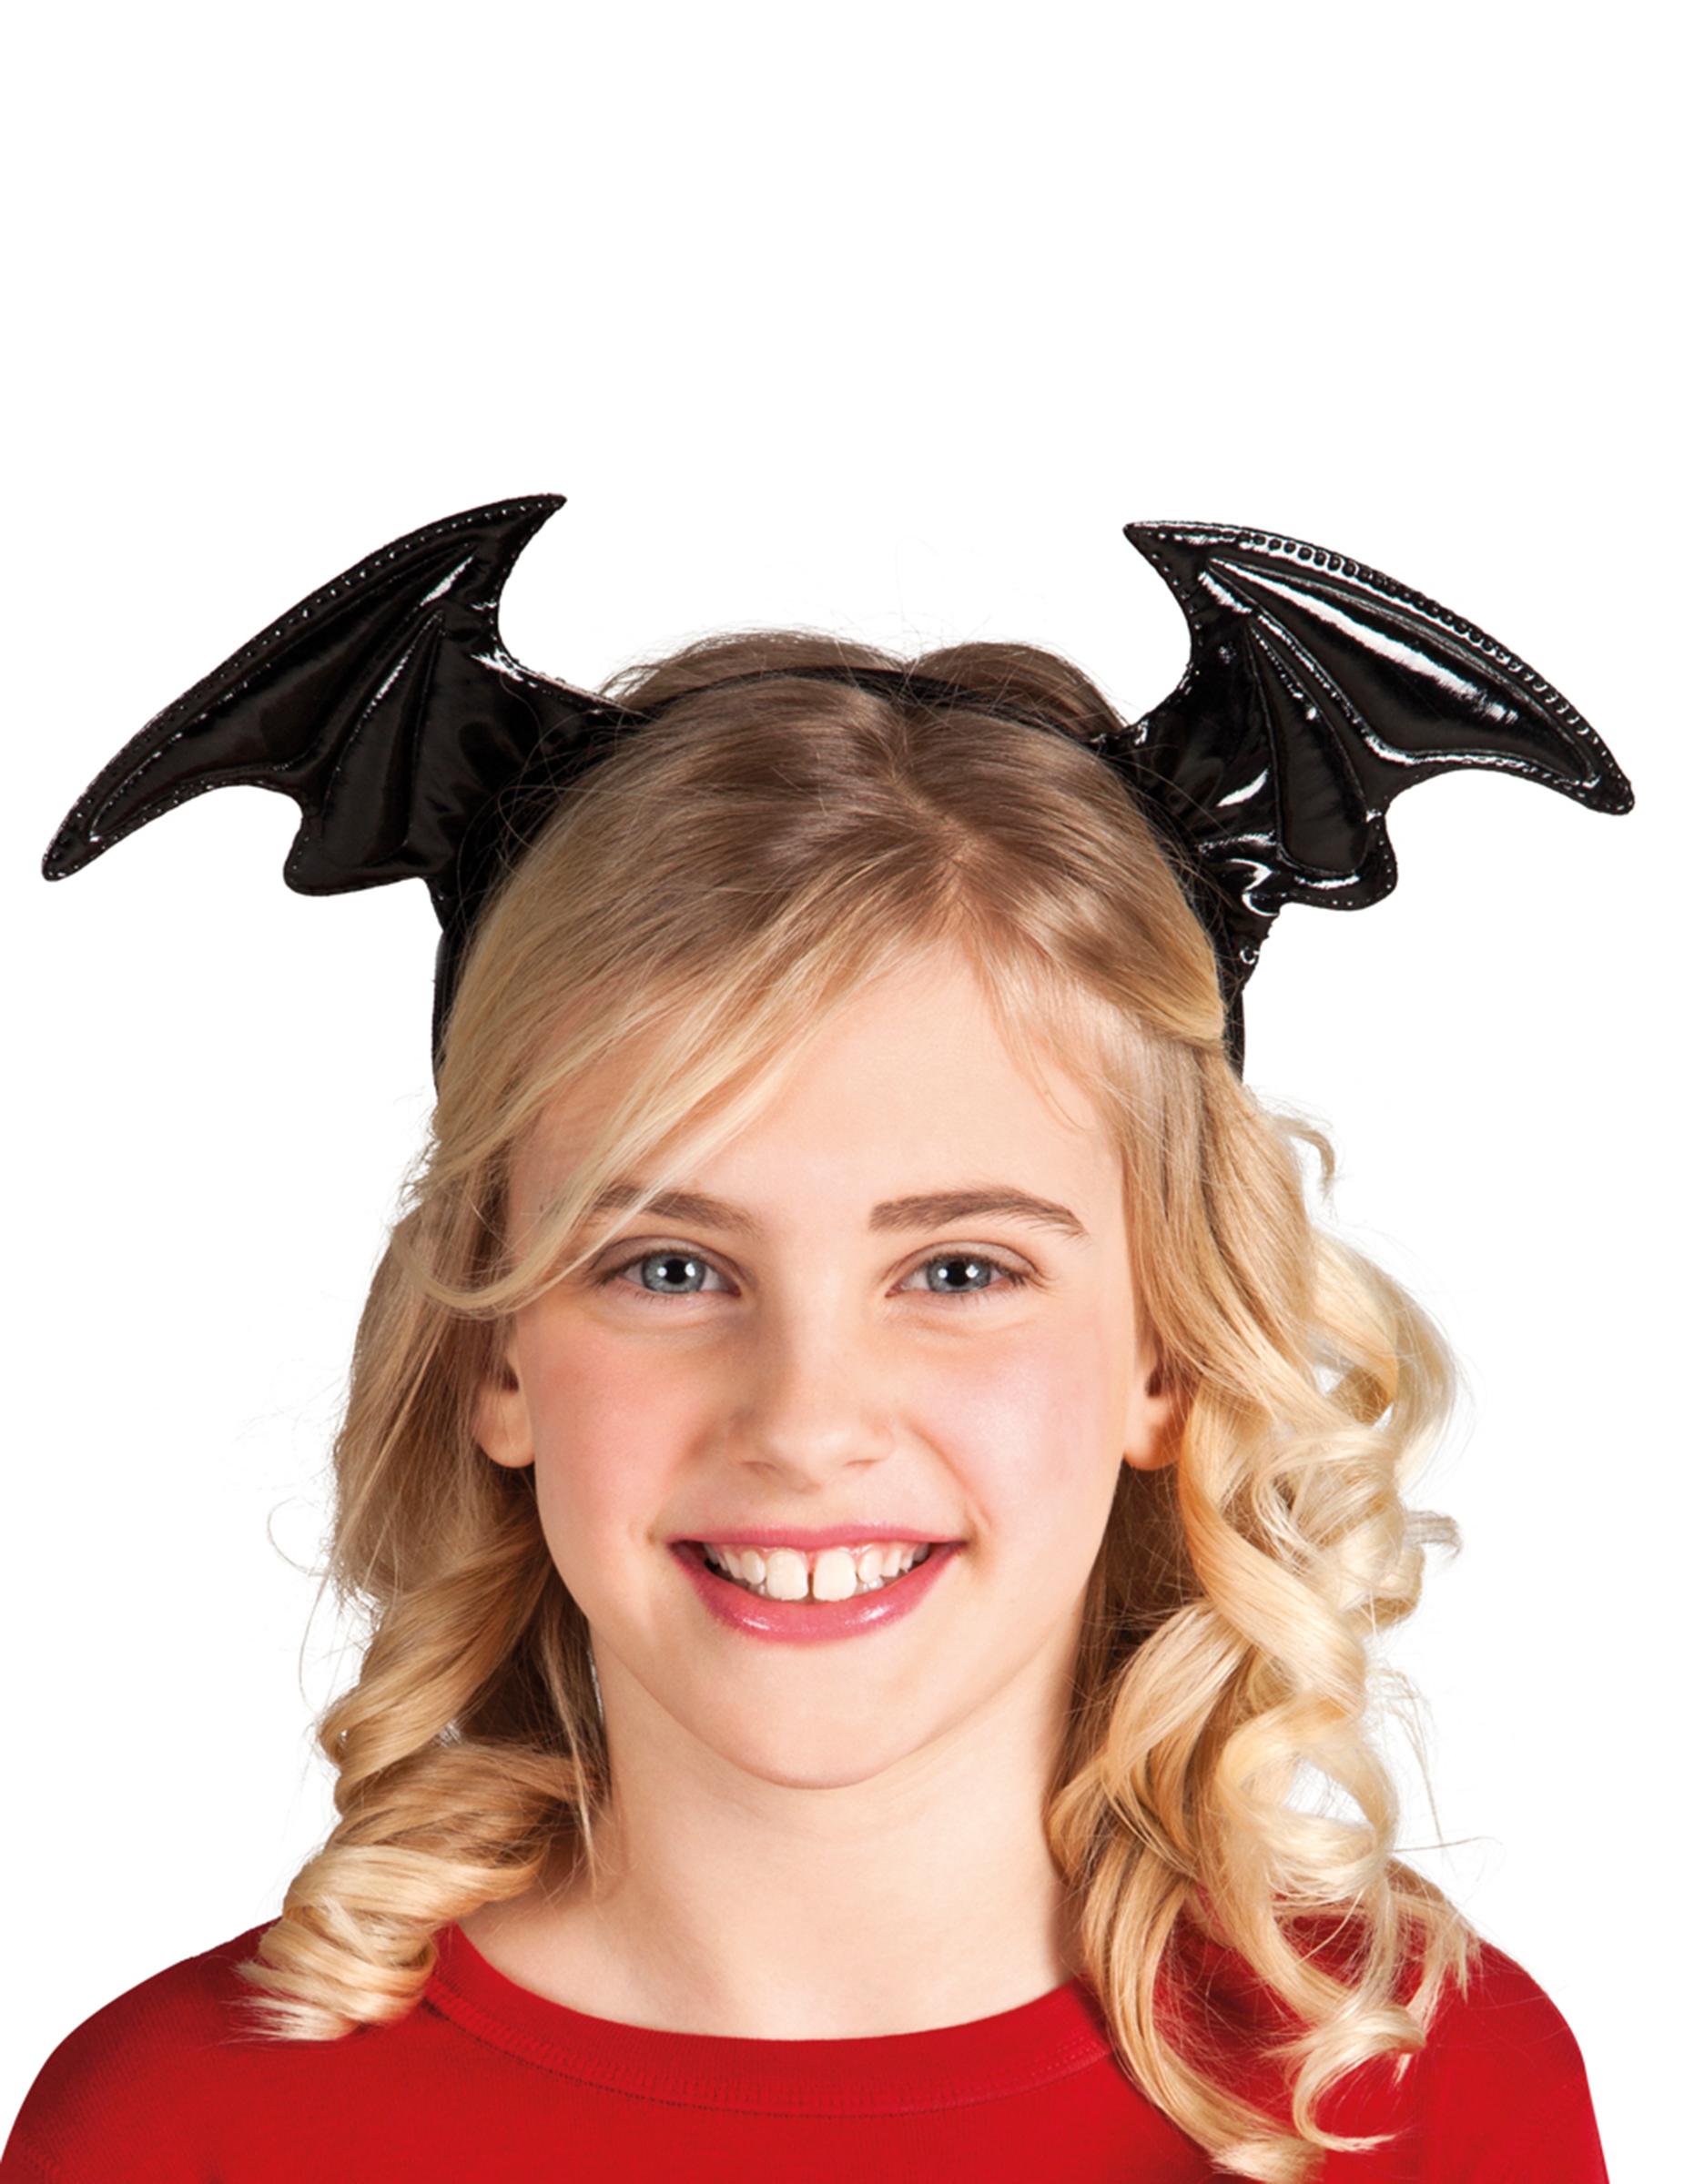 Halloween Haarreif Mit Fledermausflugeln Kostum Accessoire Fur